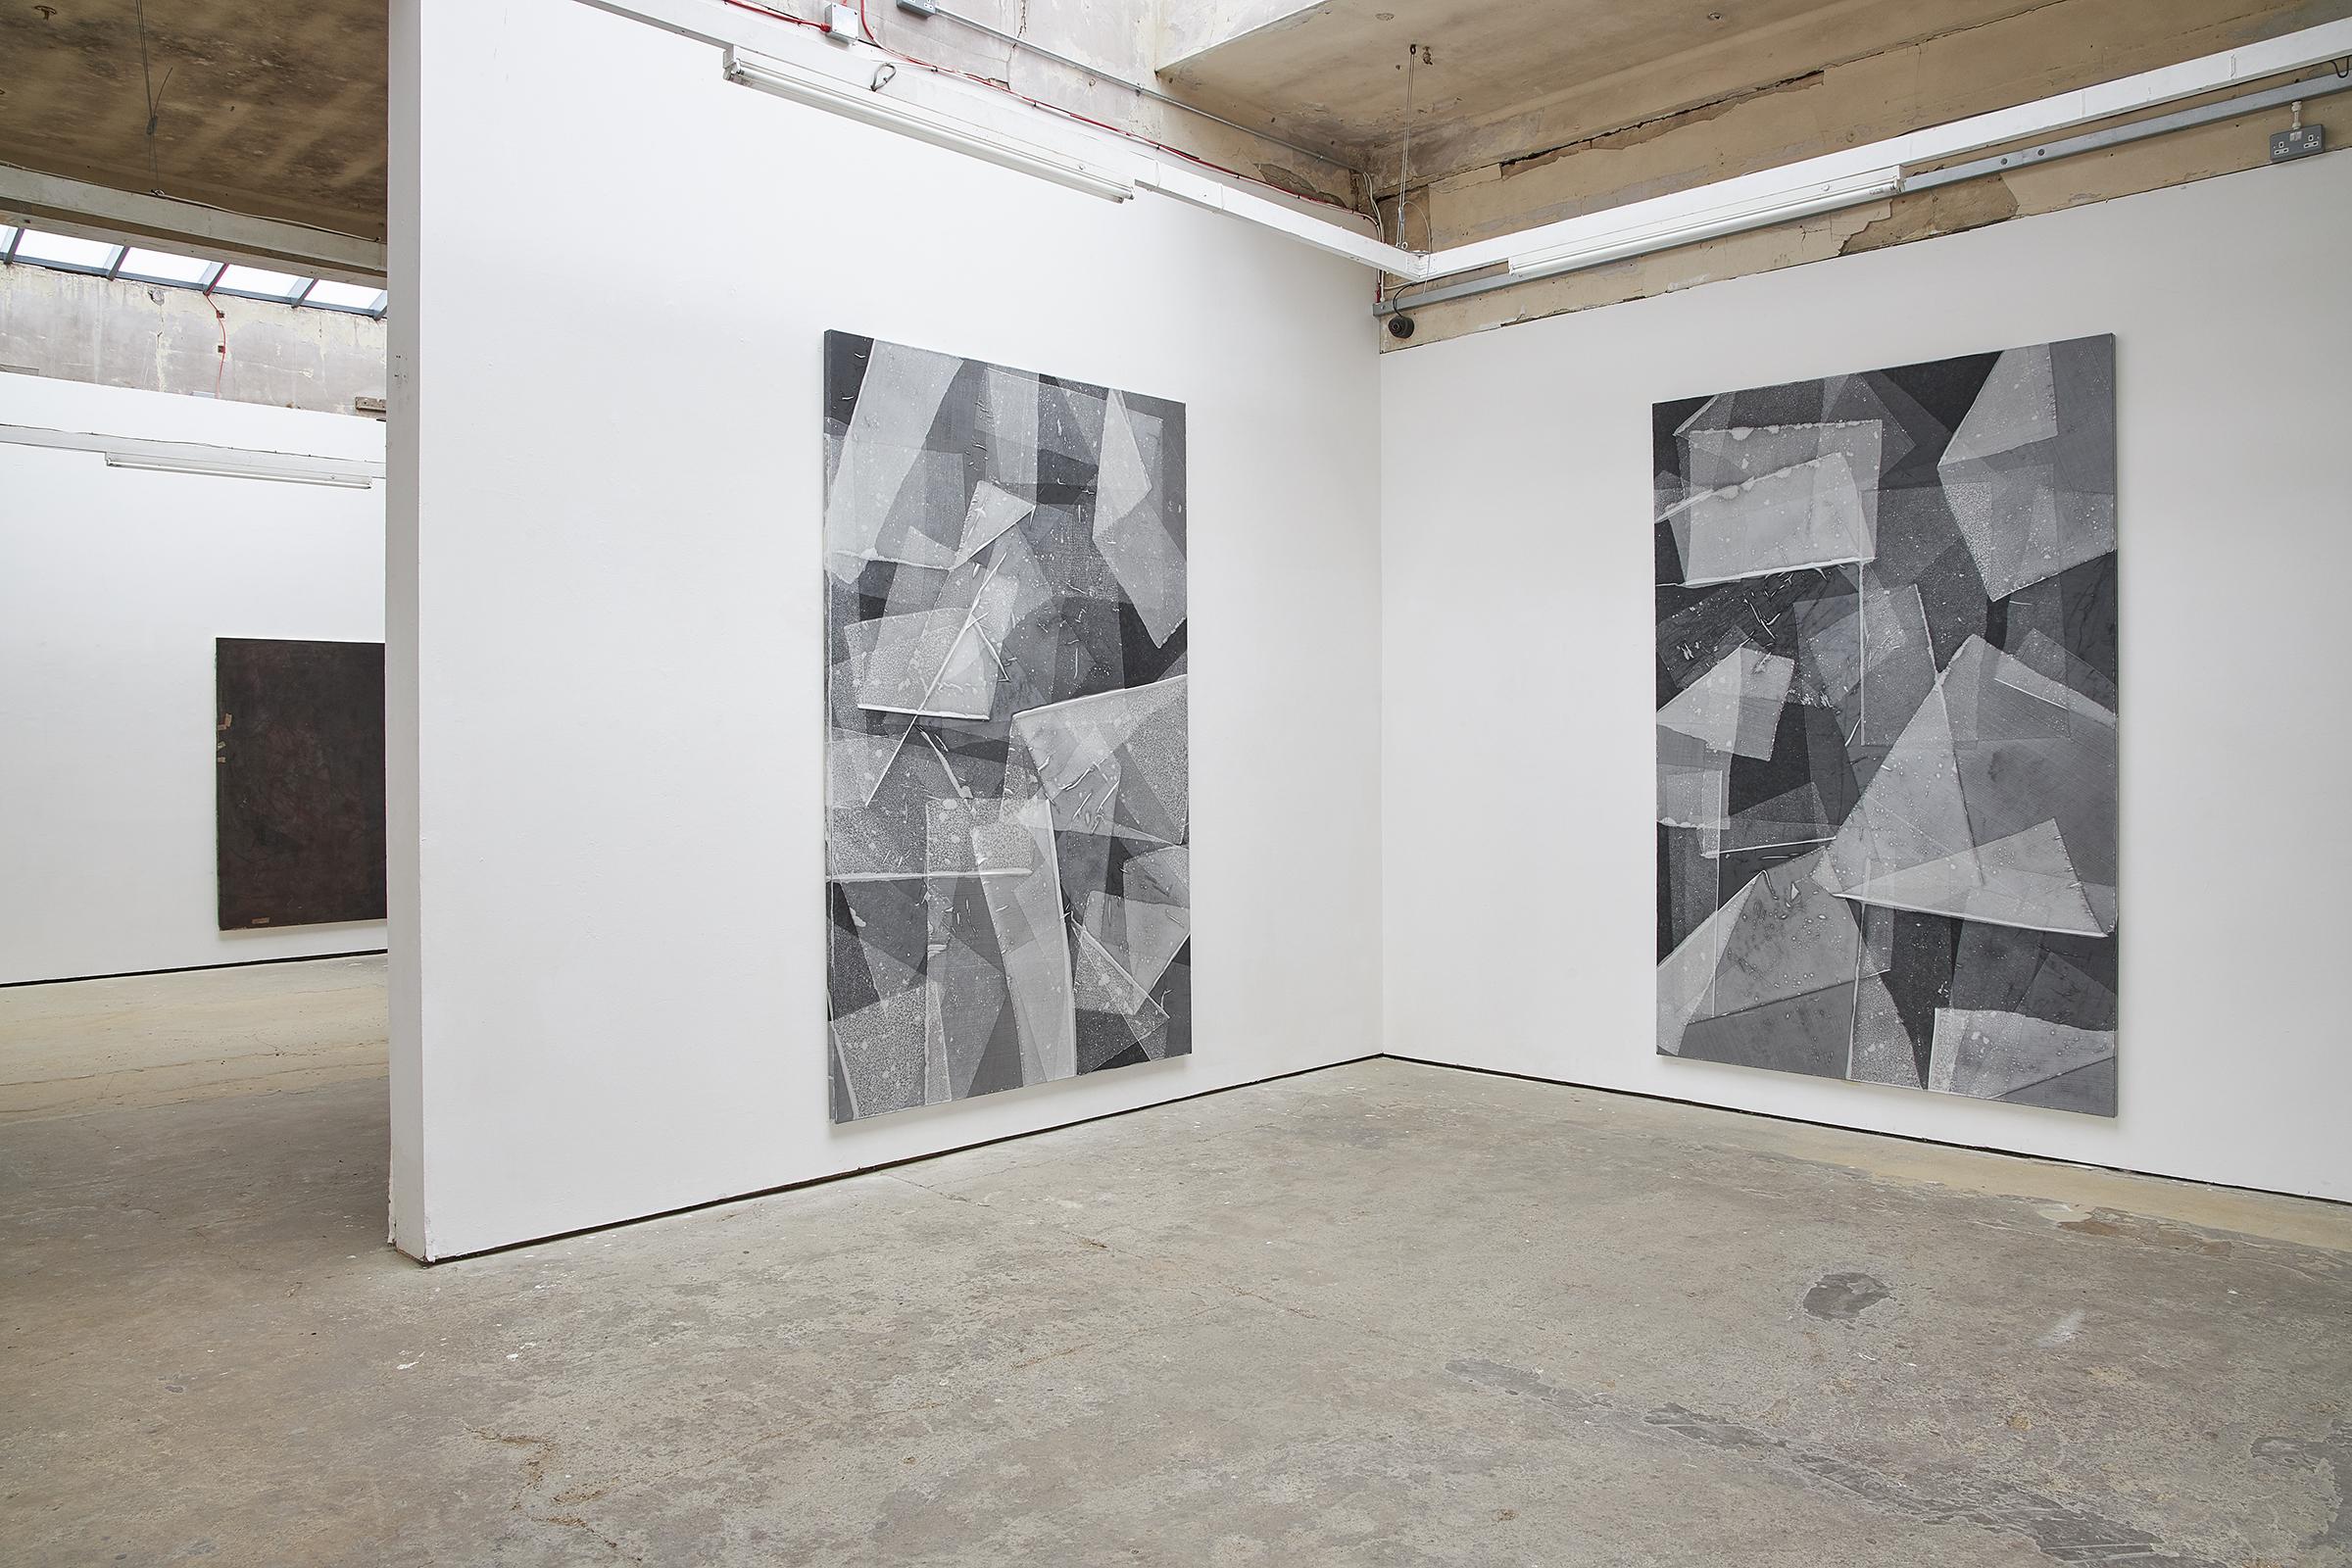 Artists_Rooms_023.jpg